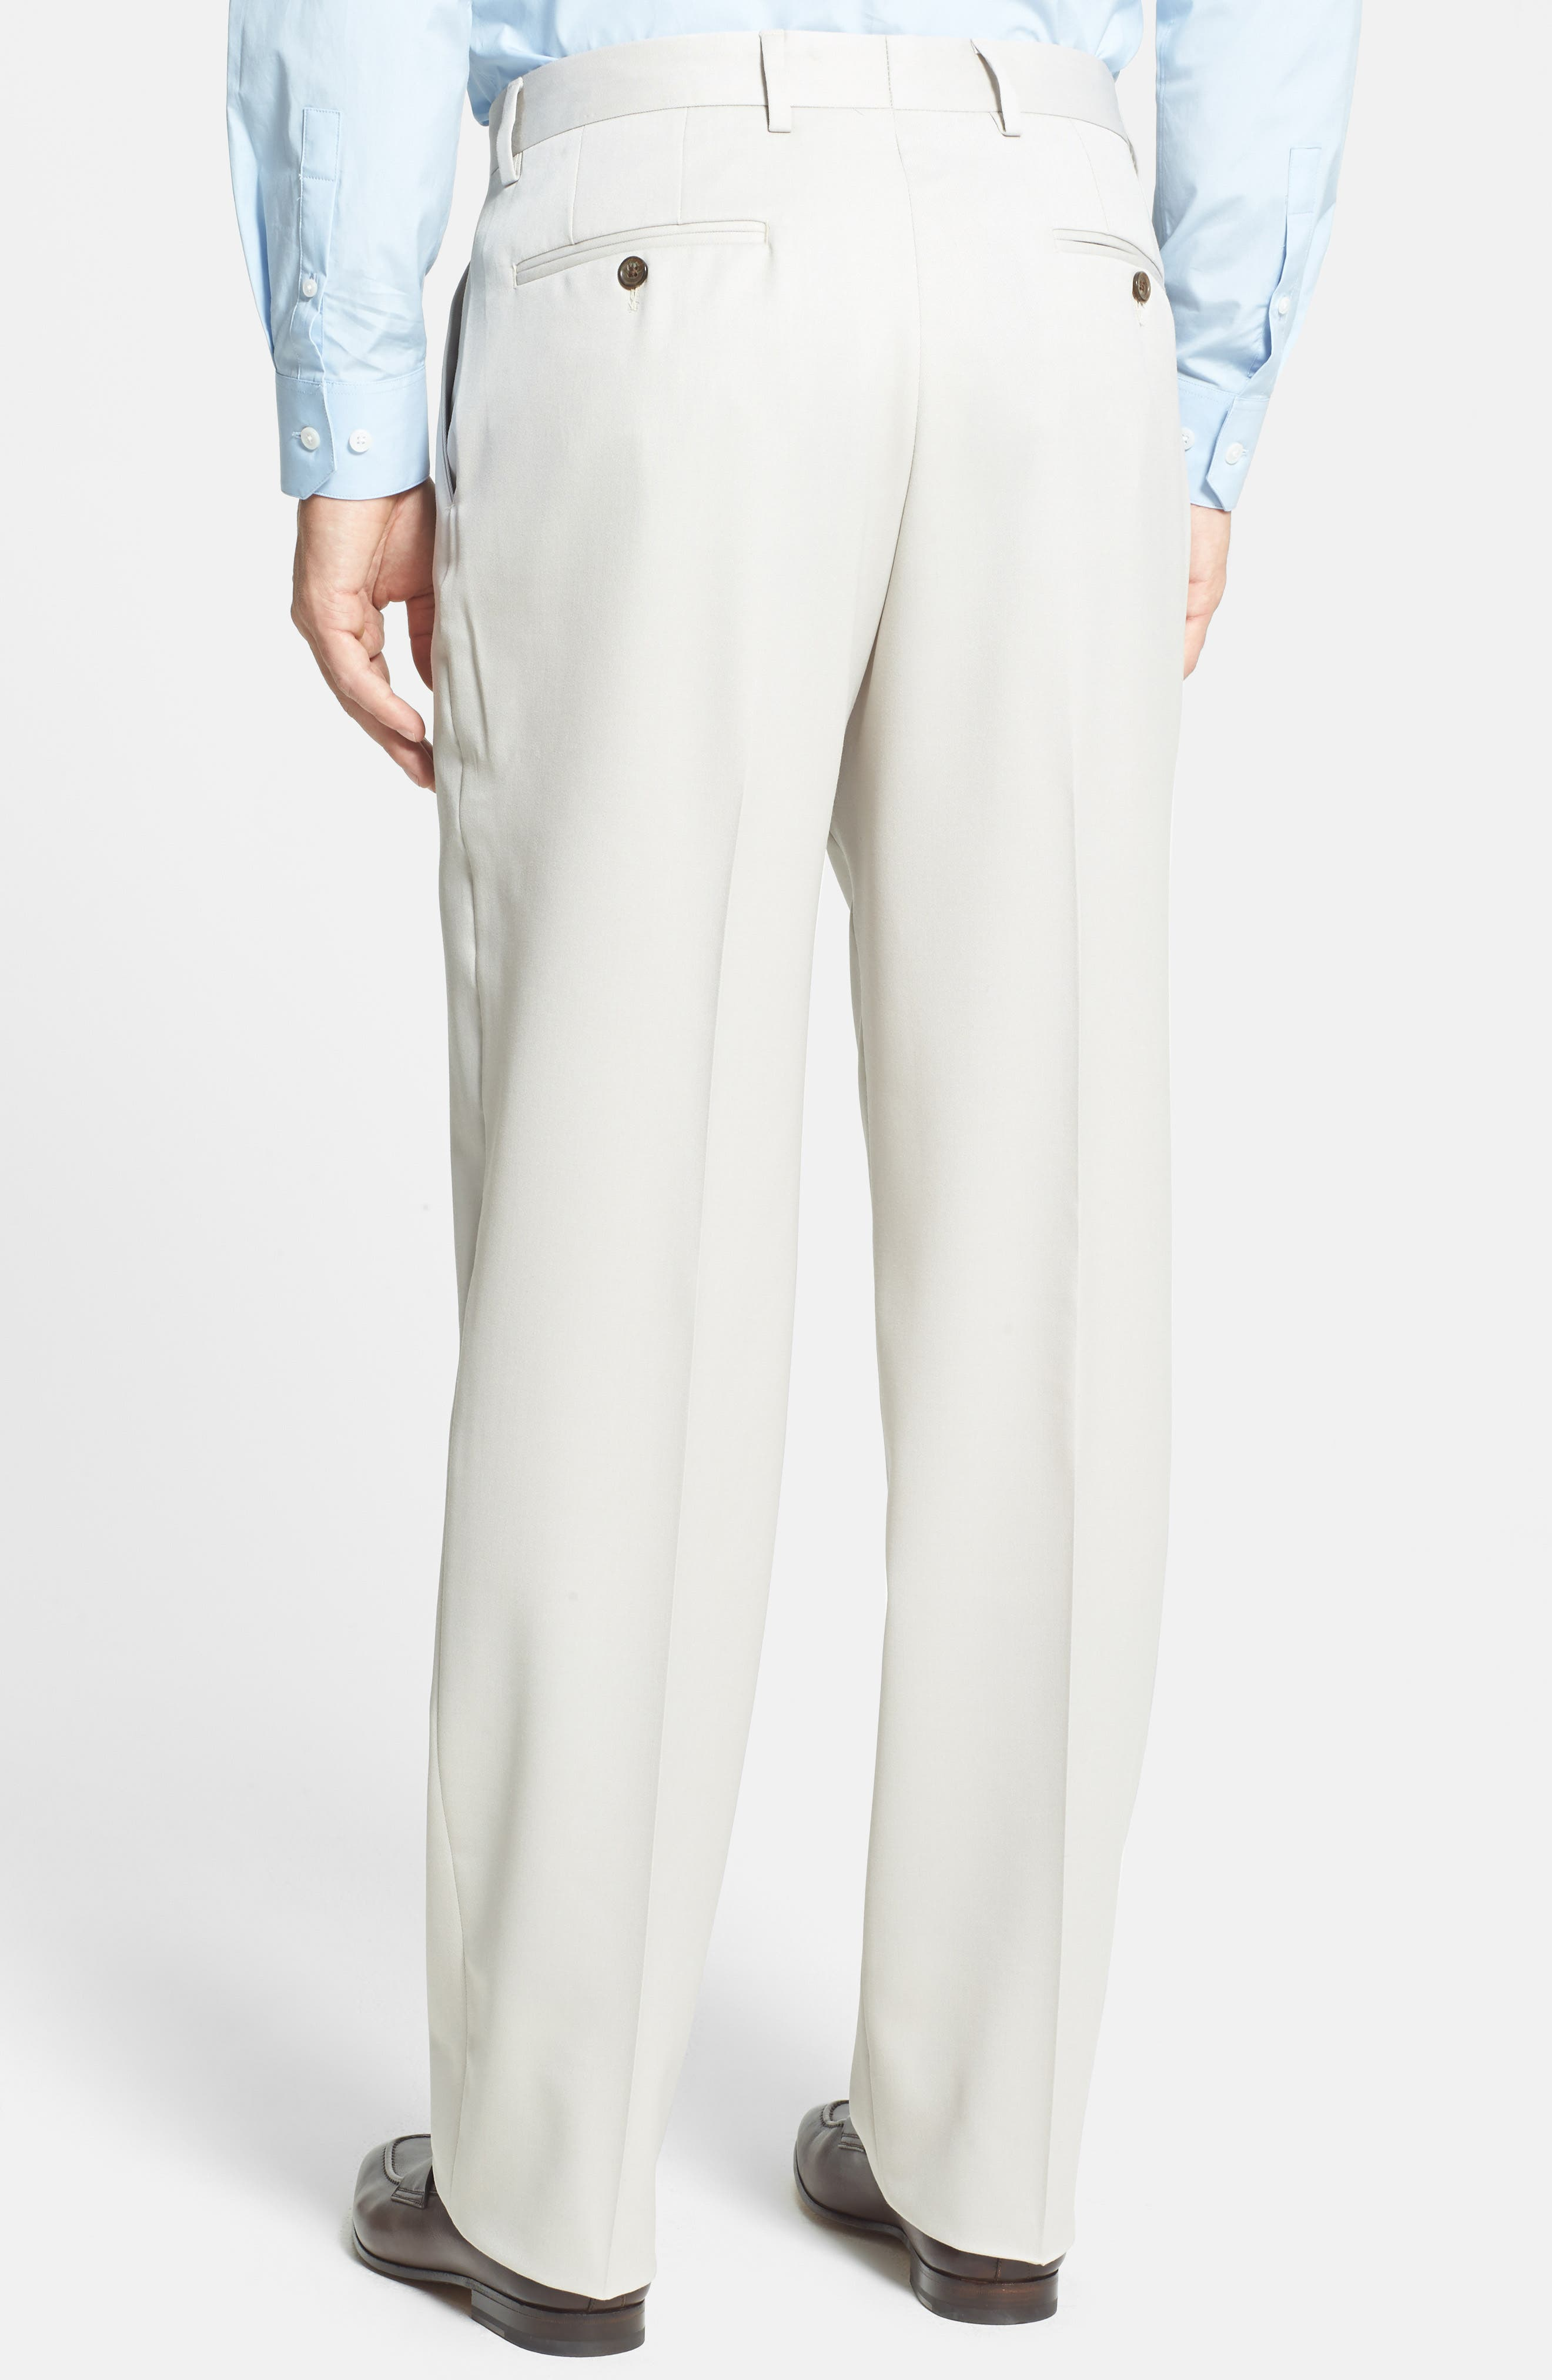 BERLE, Flat Front Wool Gabardine Trousers, Alternate thumbnail 3, color, STONE